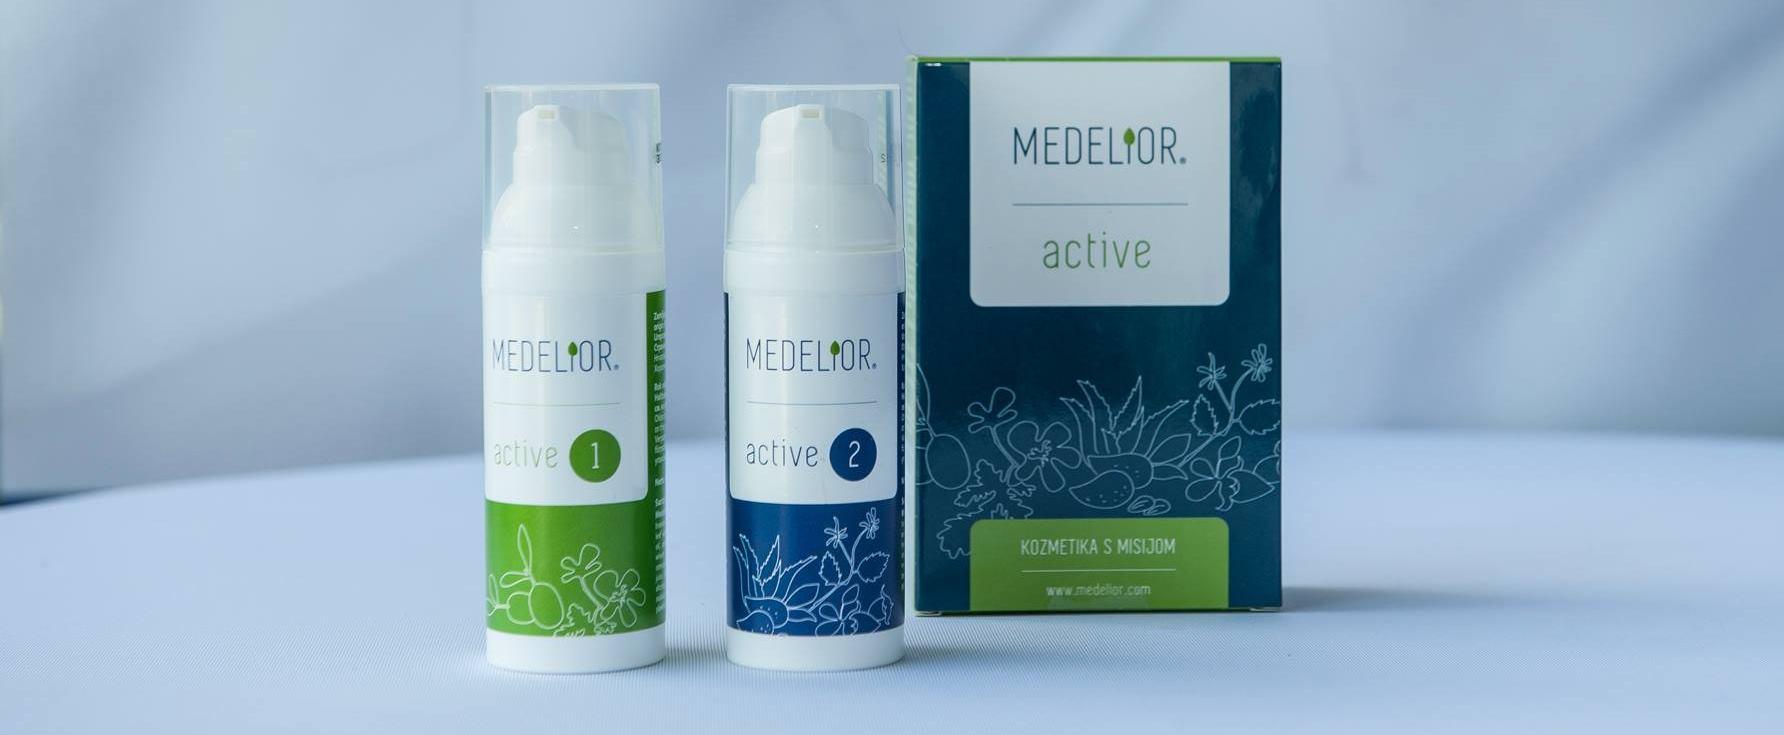 Inovativna hrvatska krema – Medelior Active